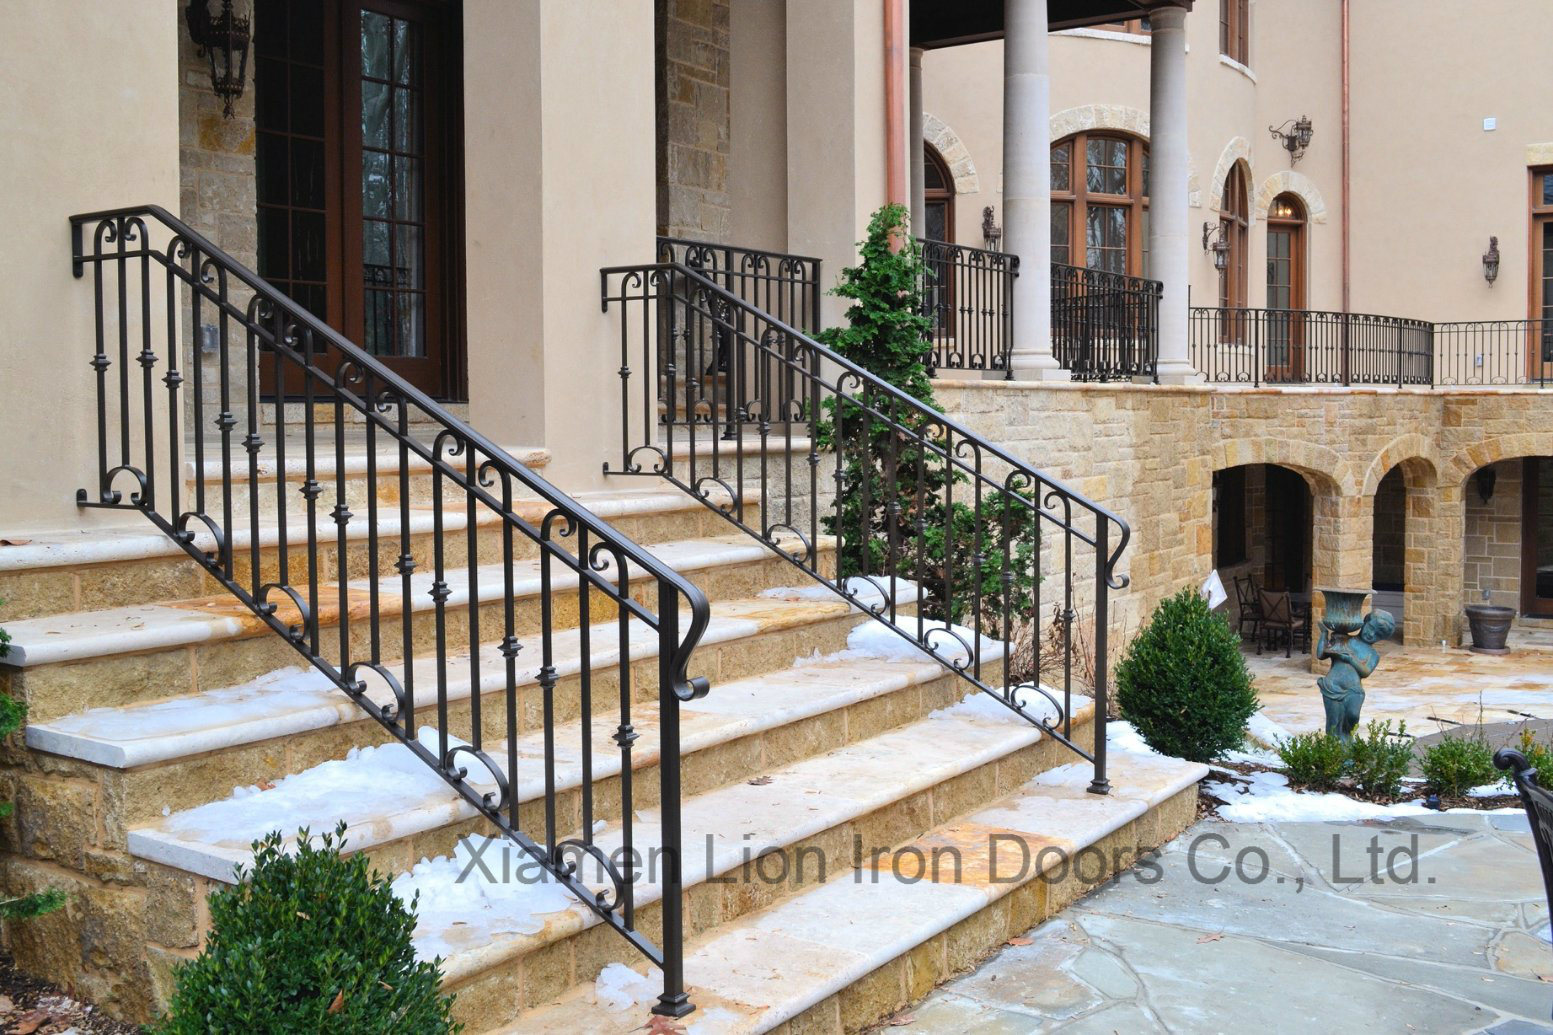 China Outdoor Black Metal Stair Railing Wrought Iron Handrail China Steel Railings Security Railing